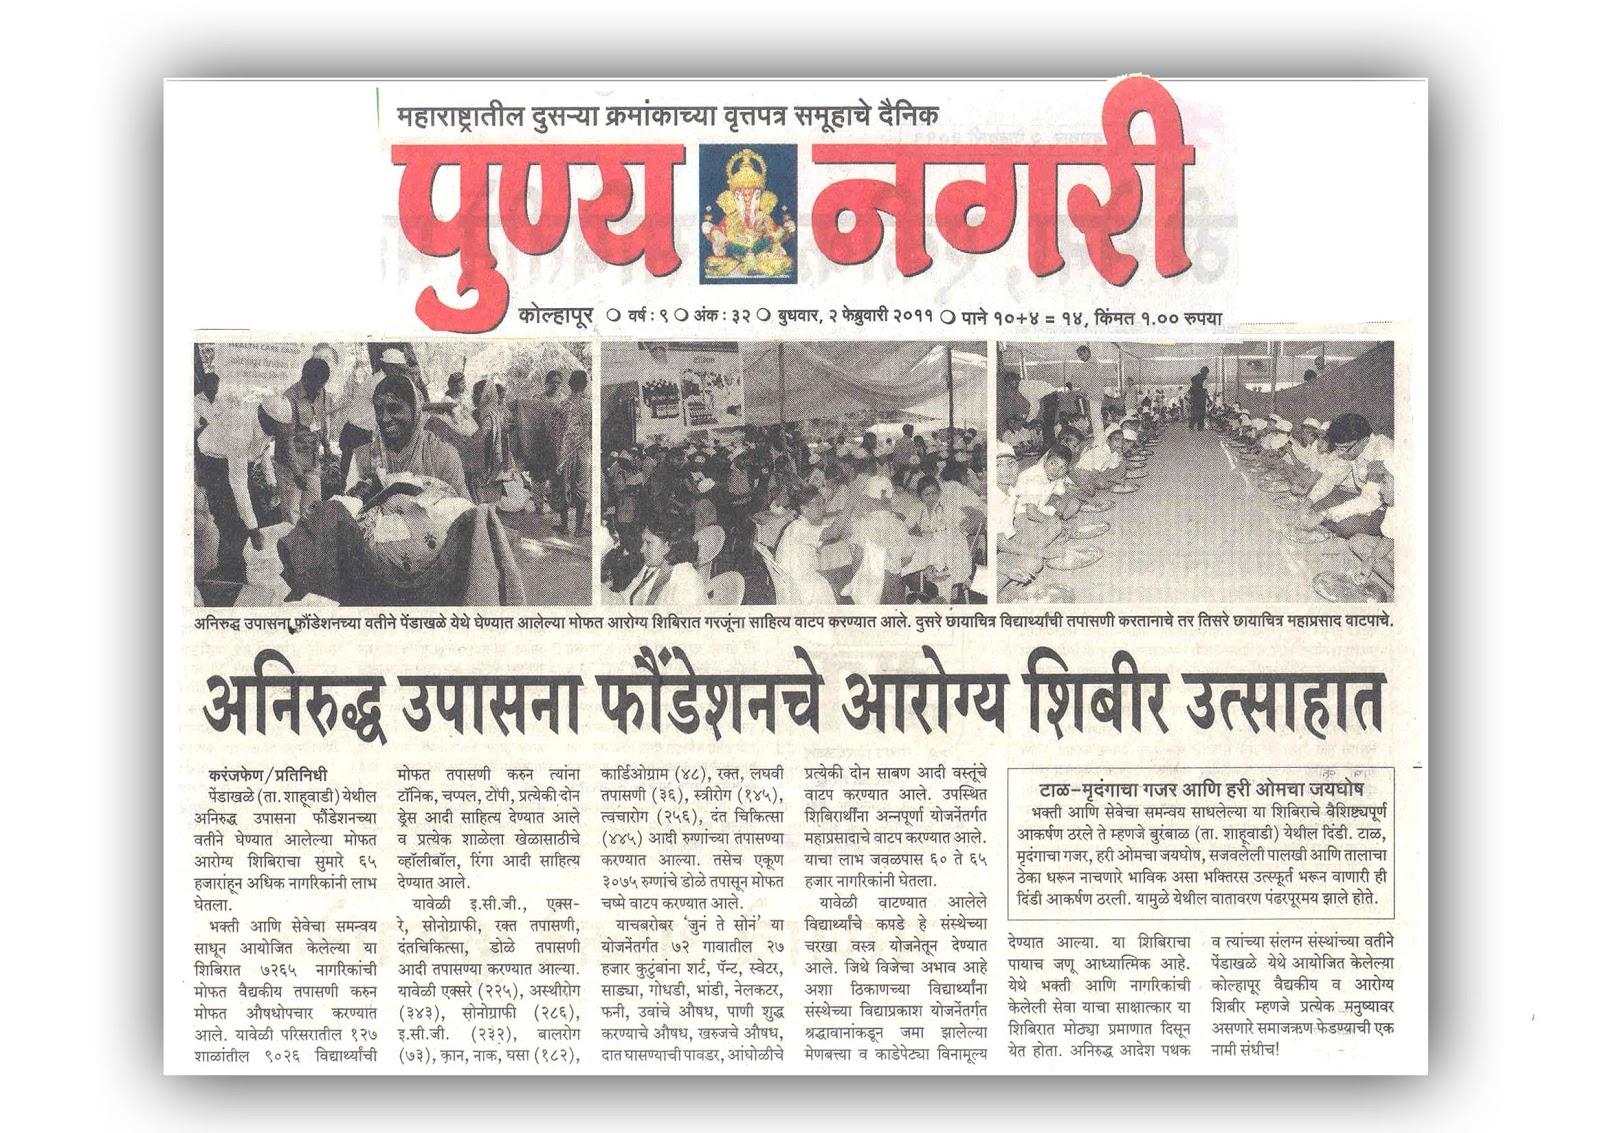 marathi press india Posts about download free marathi books written by माझे  संत तुकाराम   17th century poet of india संग्राह्य.